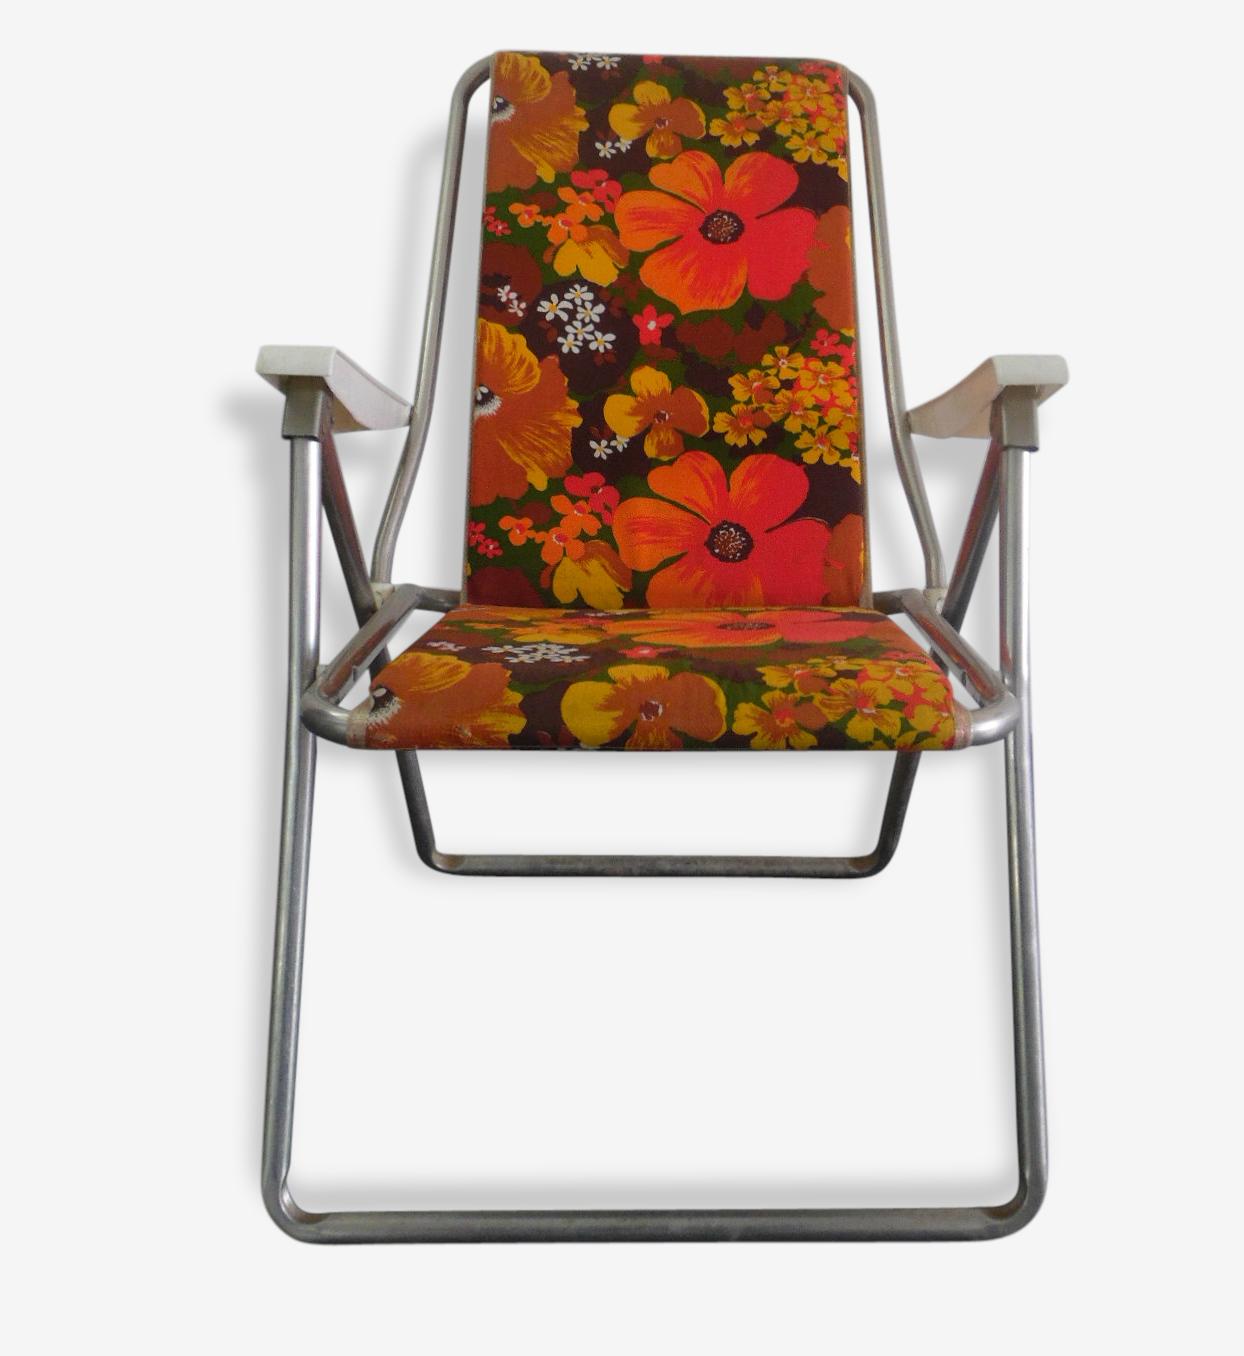 Chaise Pliante De Camping Kettler Vintage Metal Orange